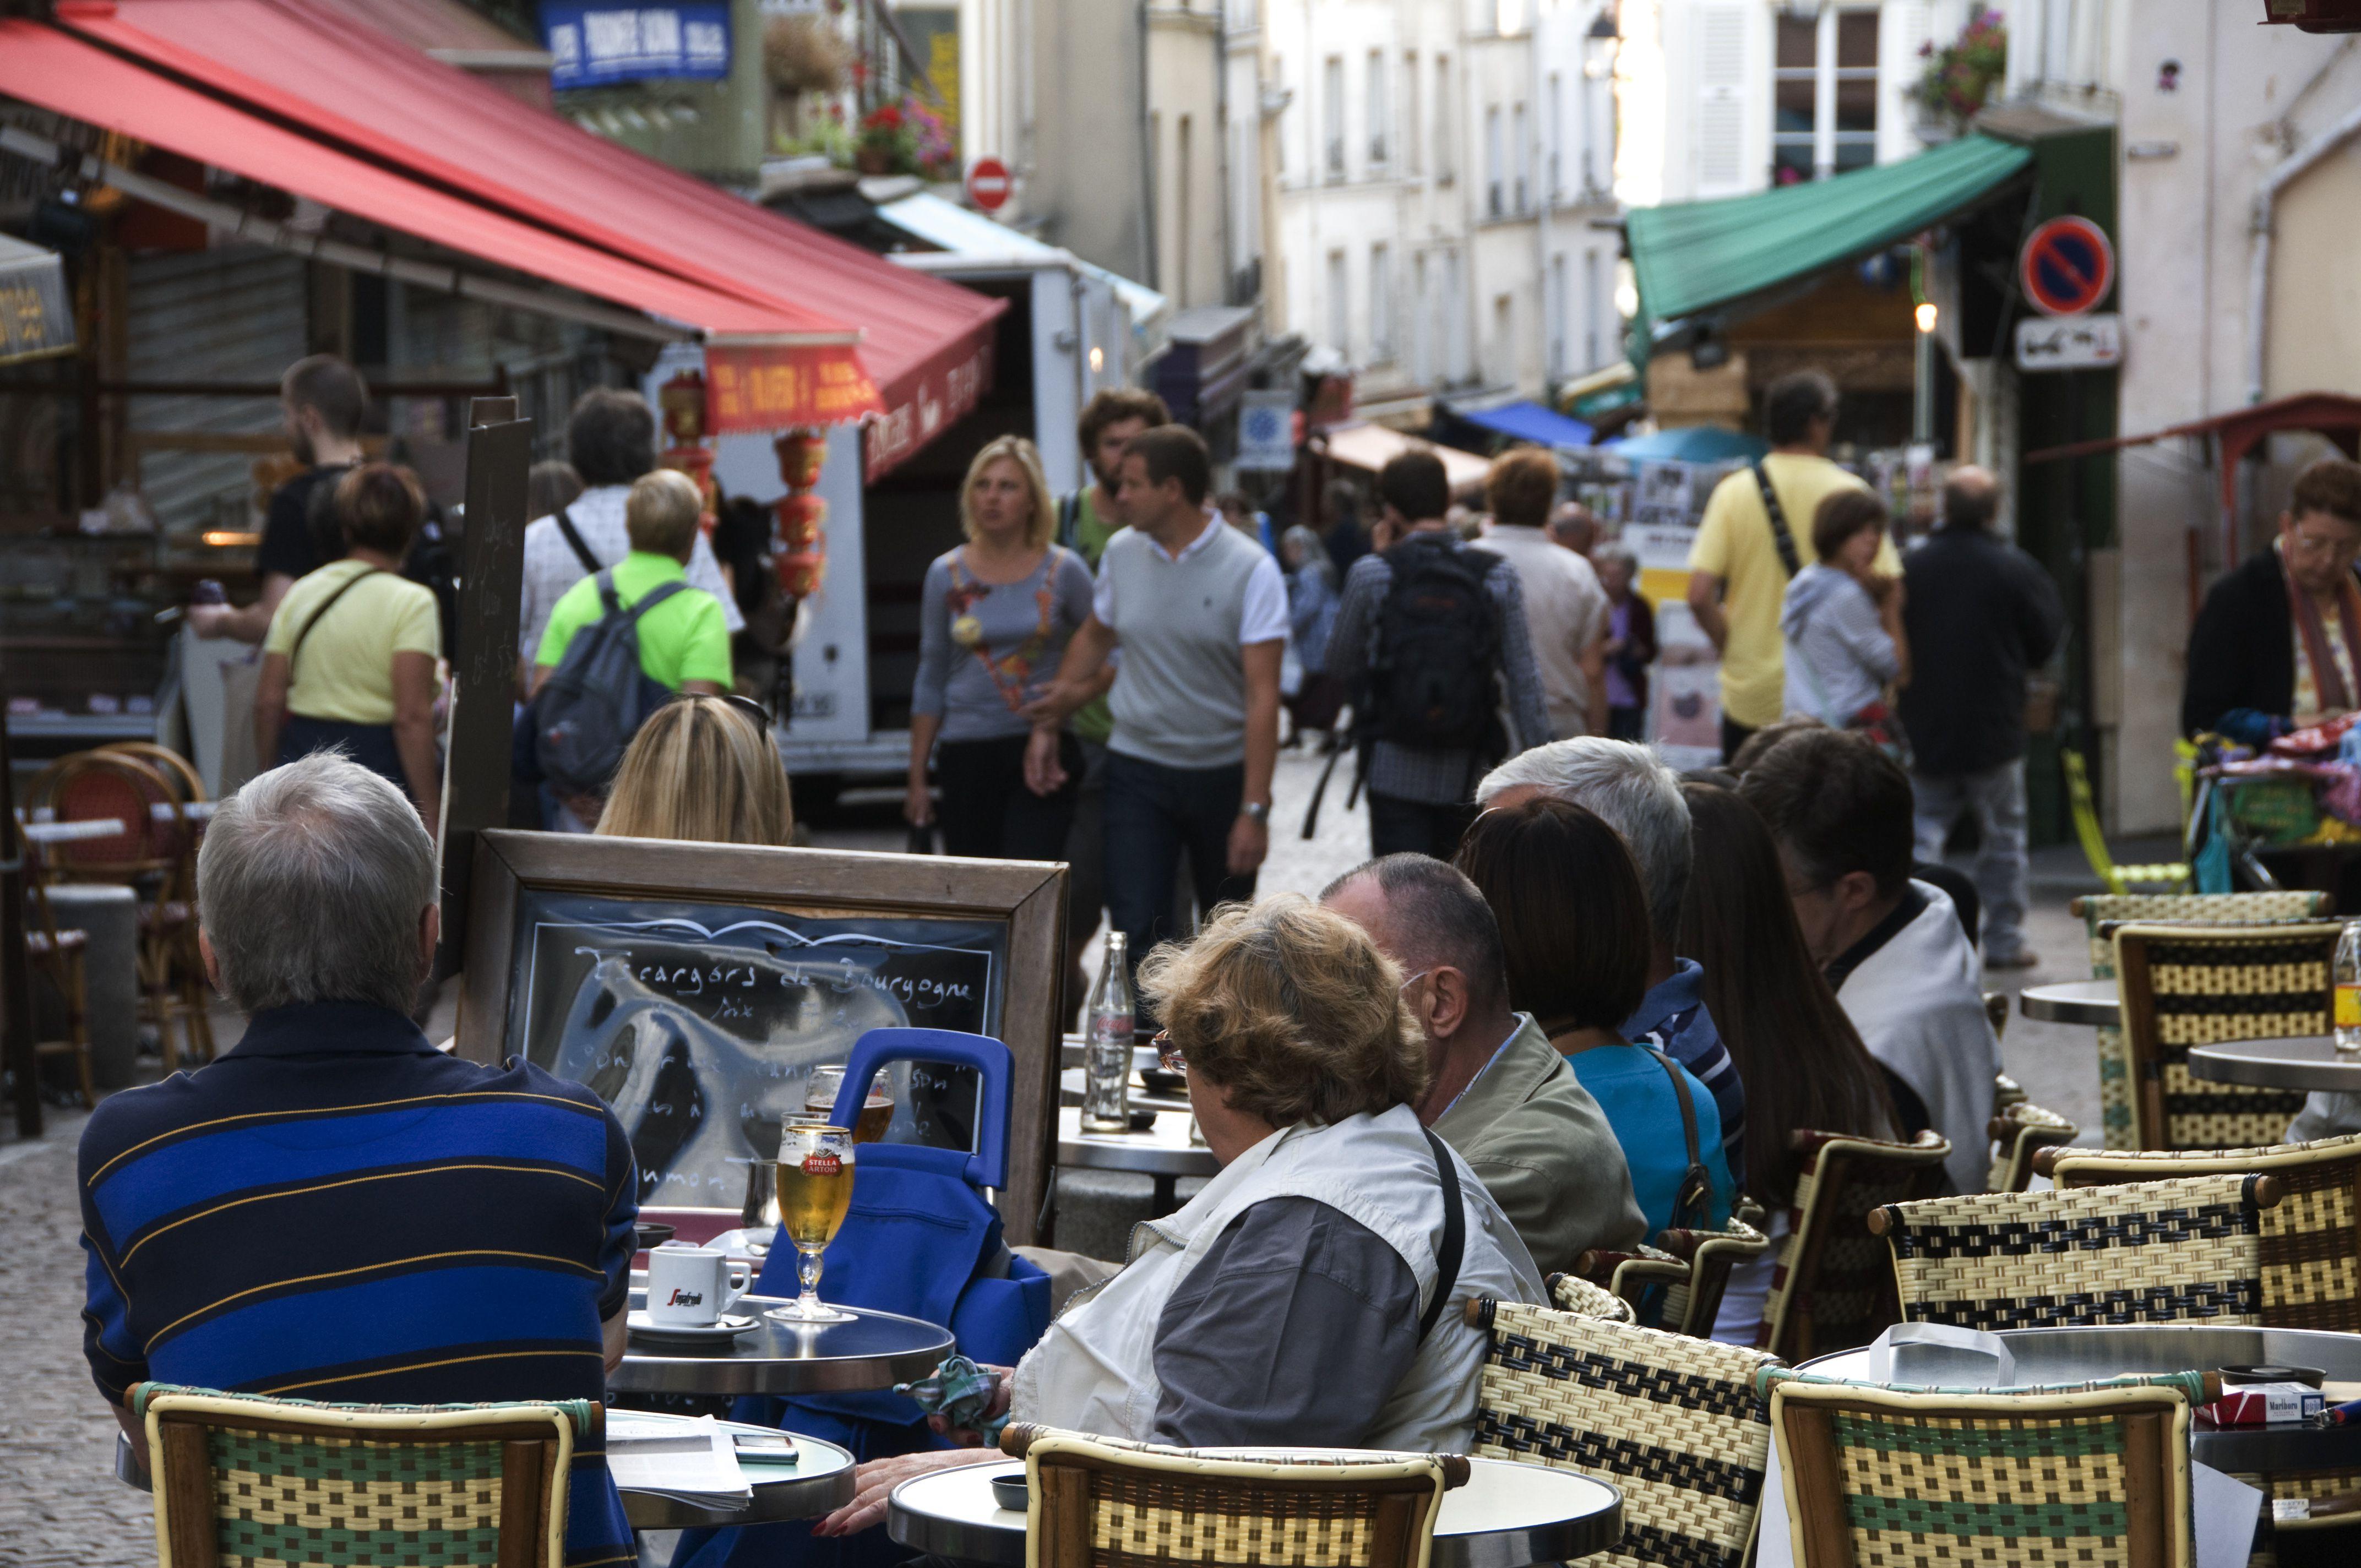 In Focus The Rue MouffetardJussieu District in Paris